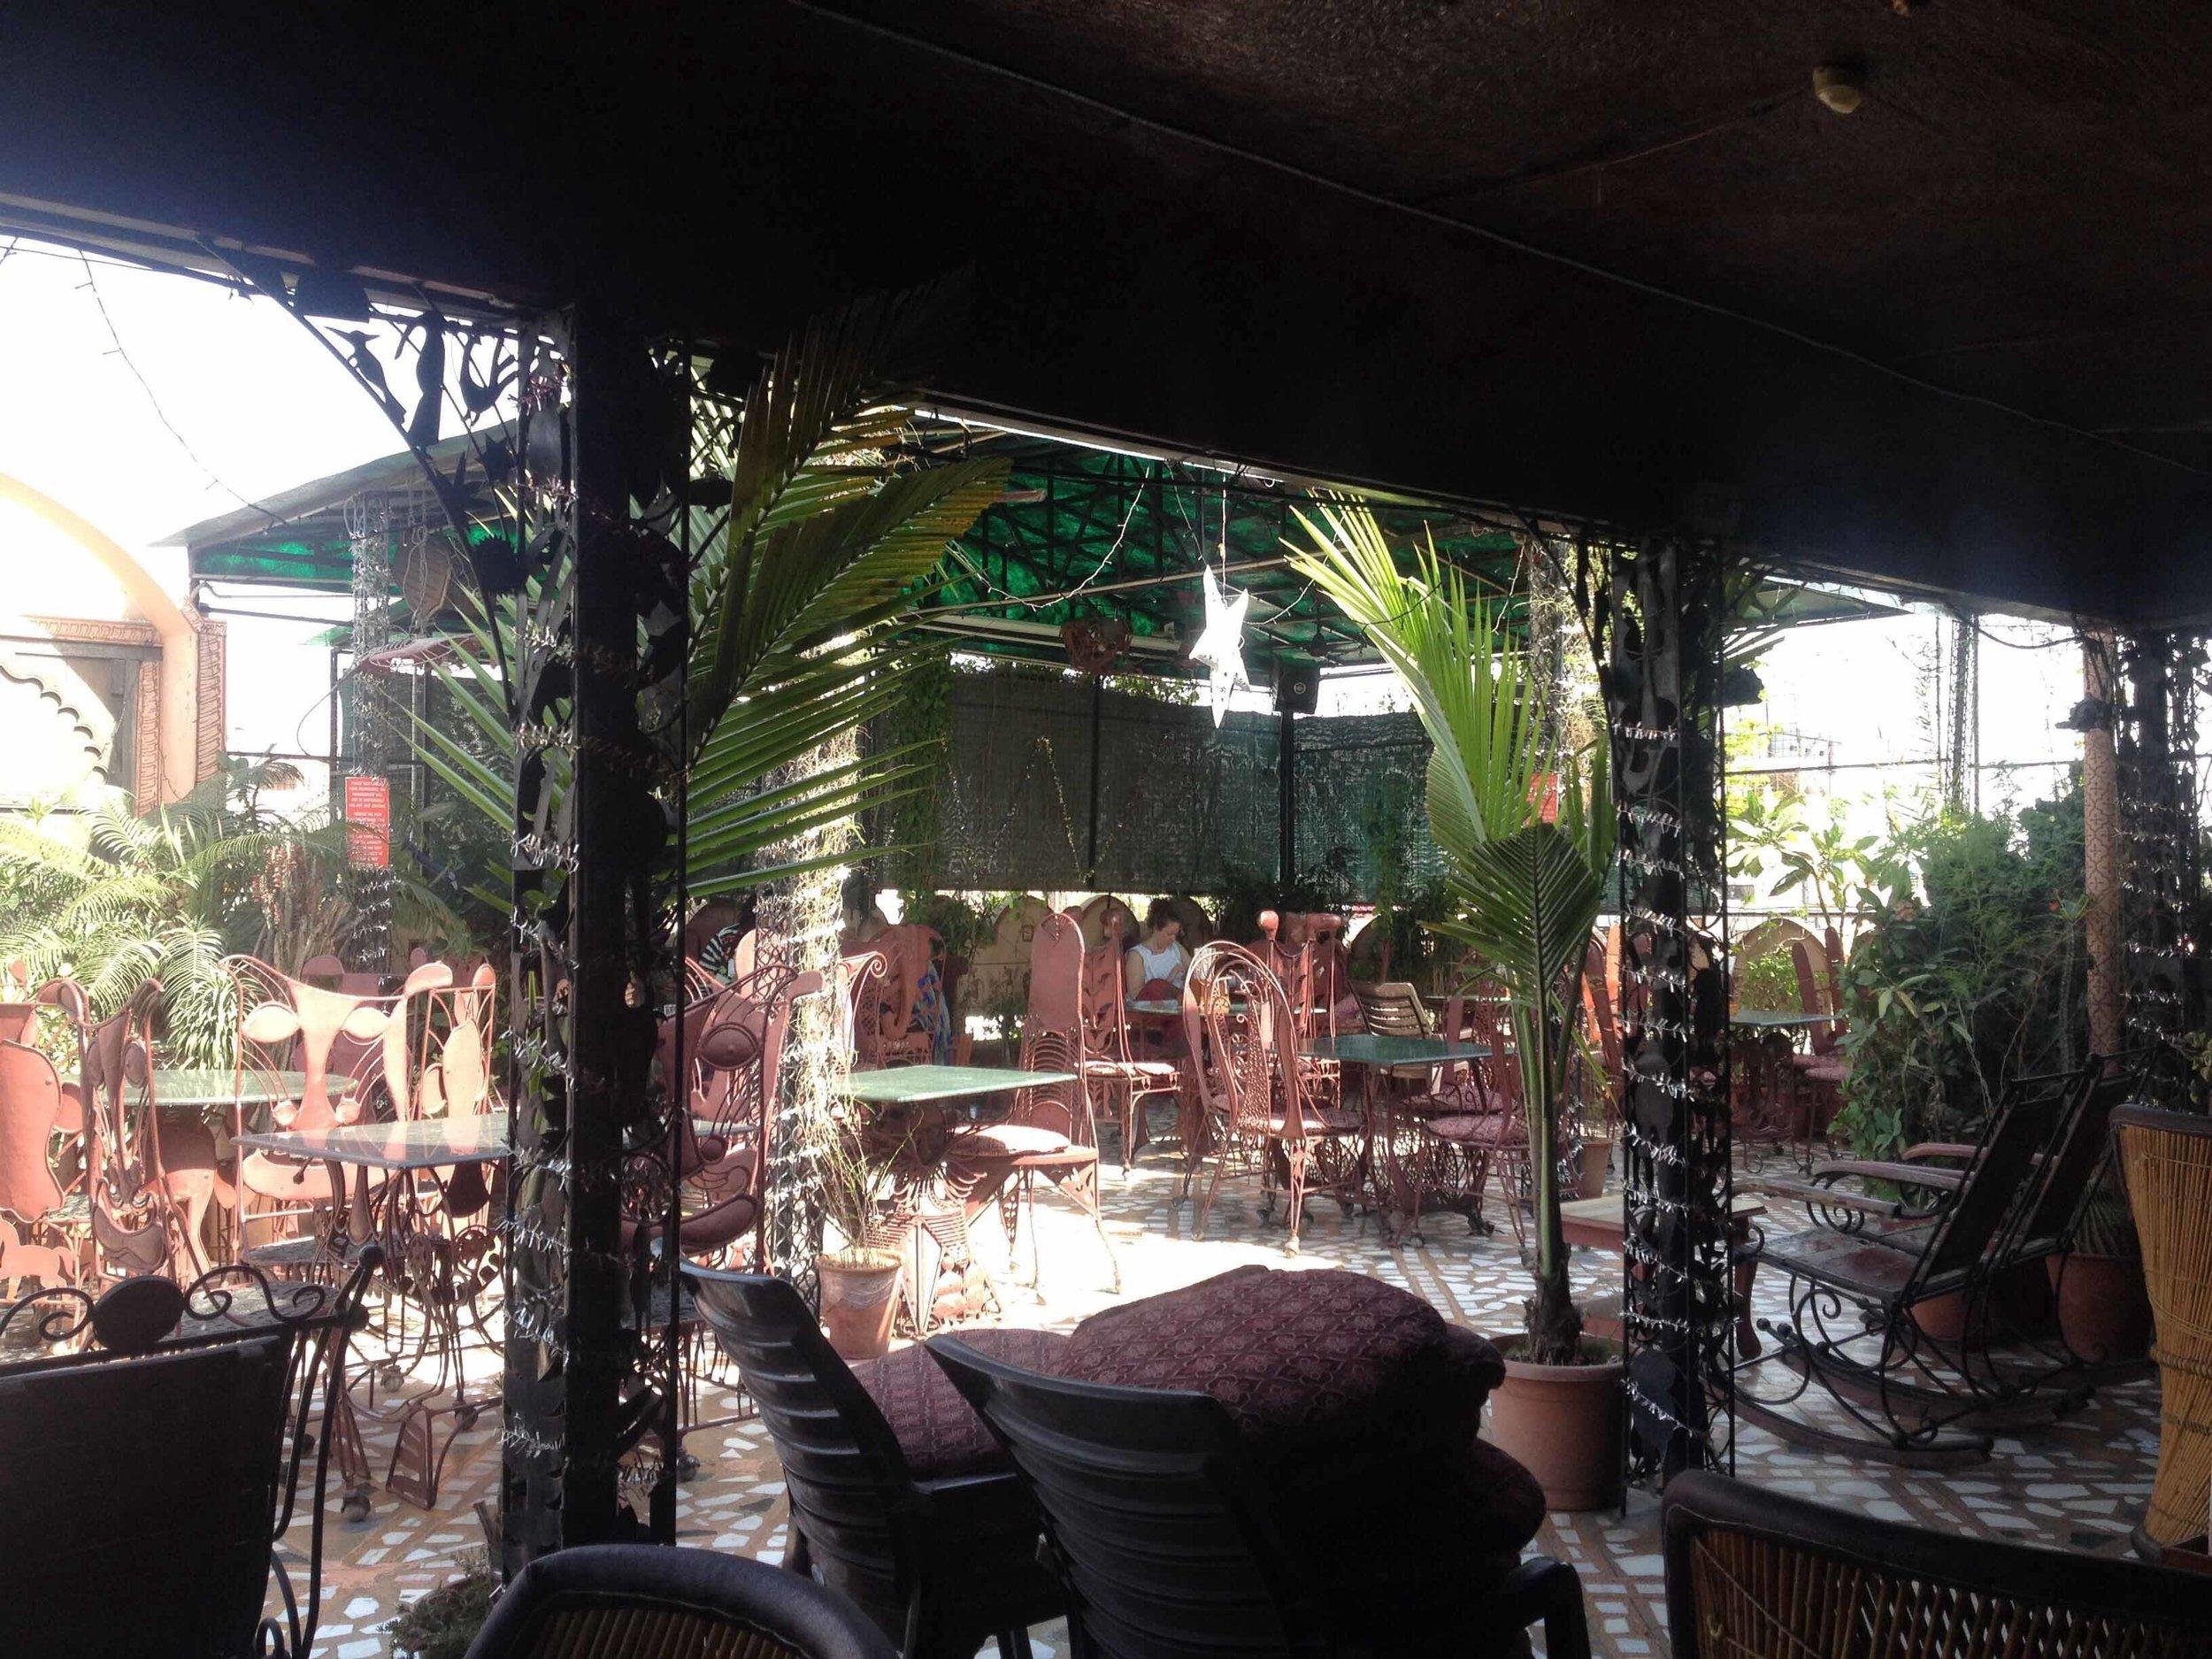 https://www.zomato.com/jaipur/peacock-roof-top-restaurant-gopalbari/photos